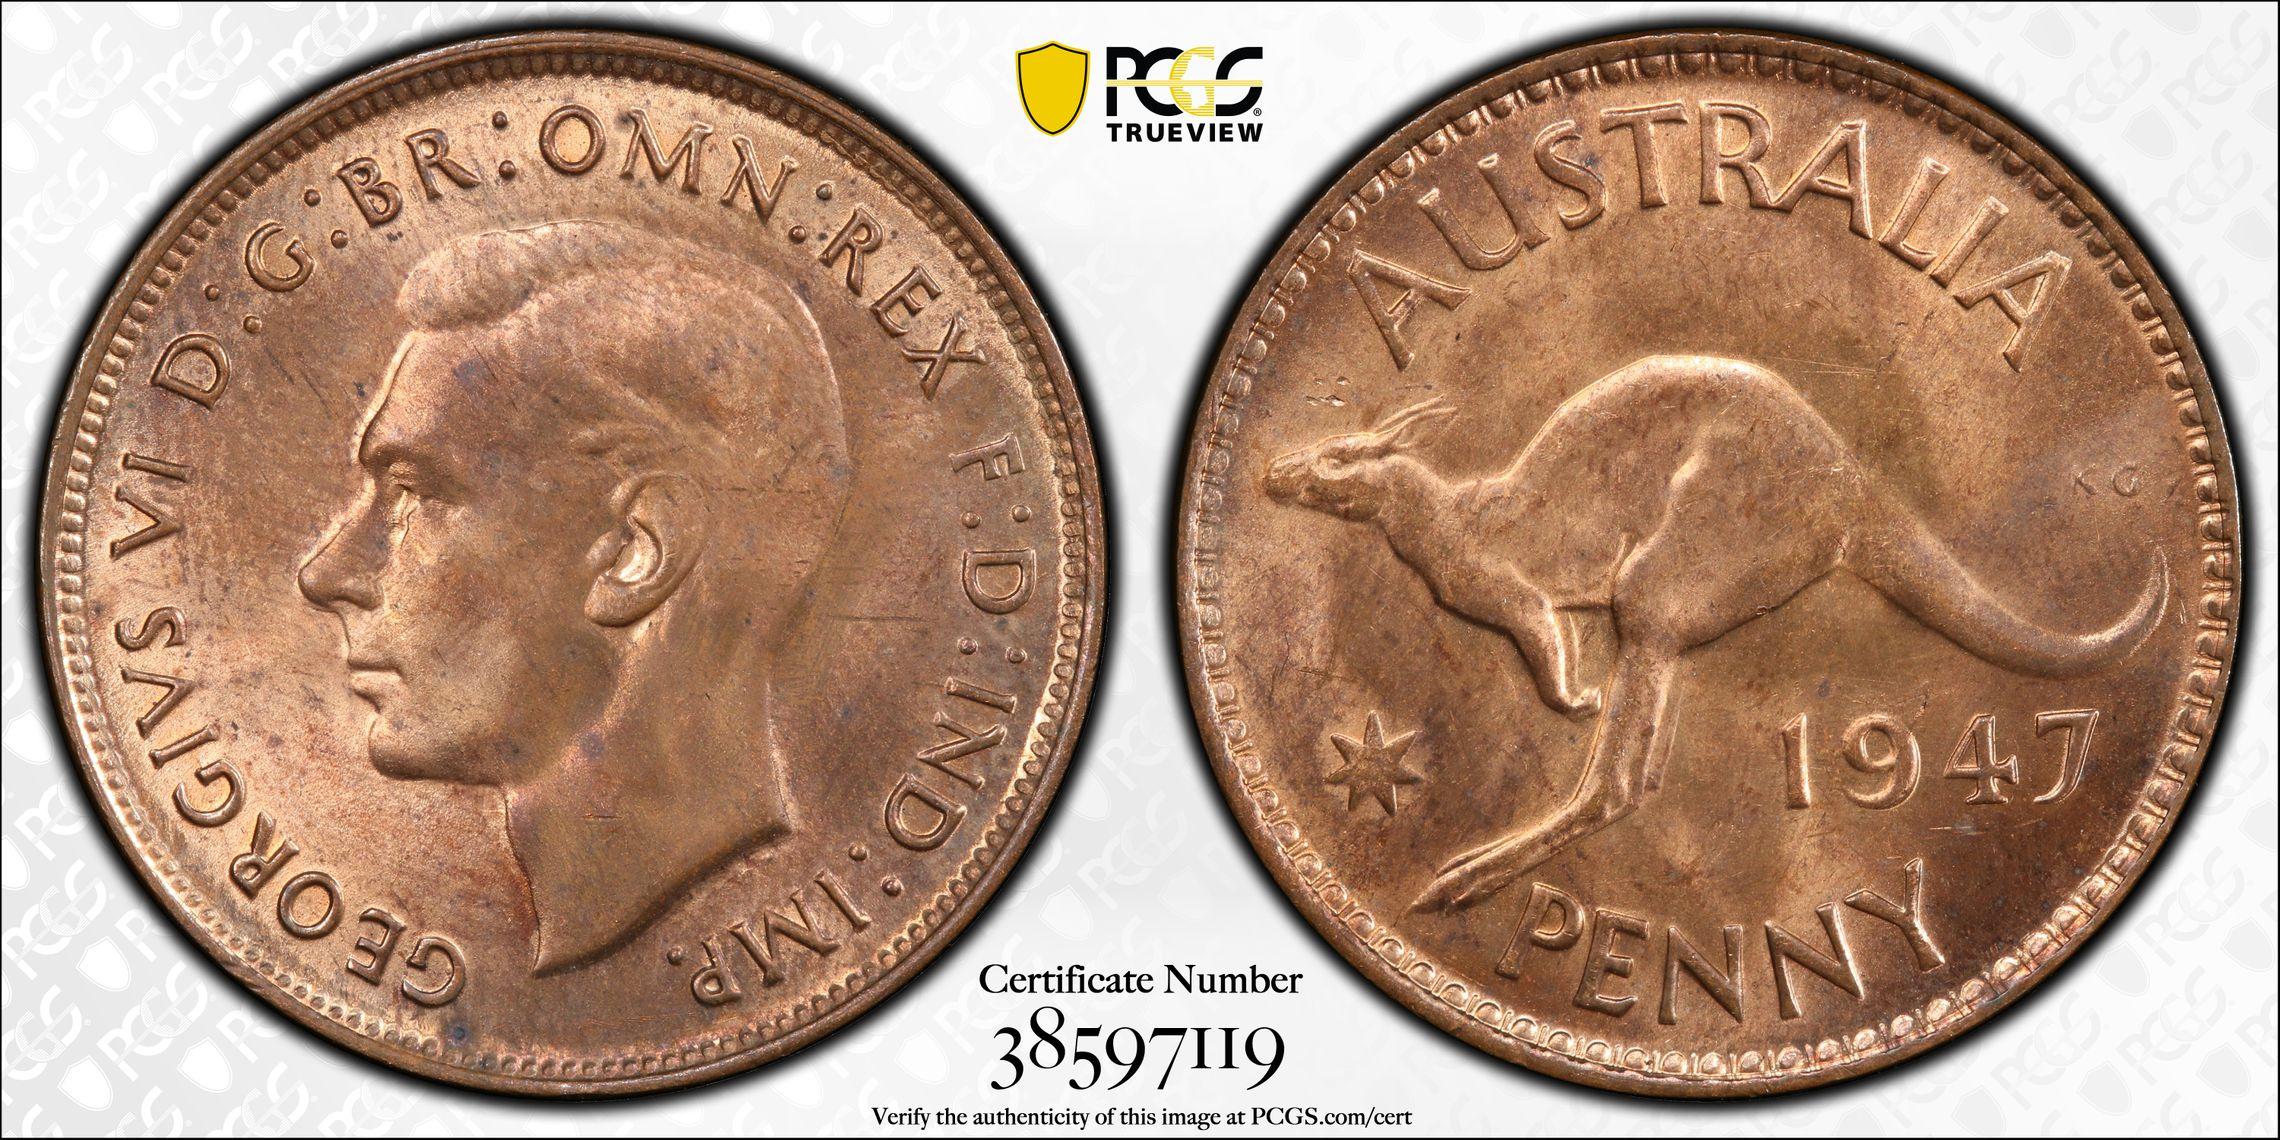 Australia 1947 Penny - PCGS MS64RB